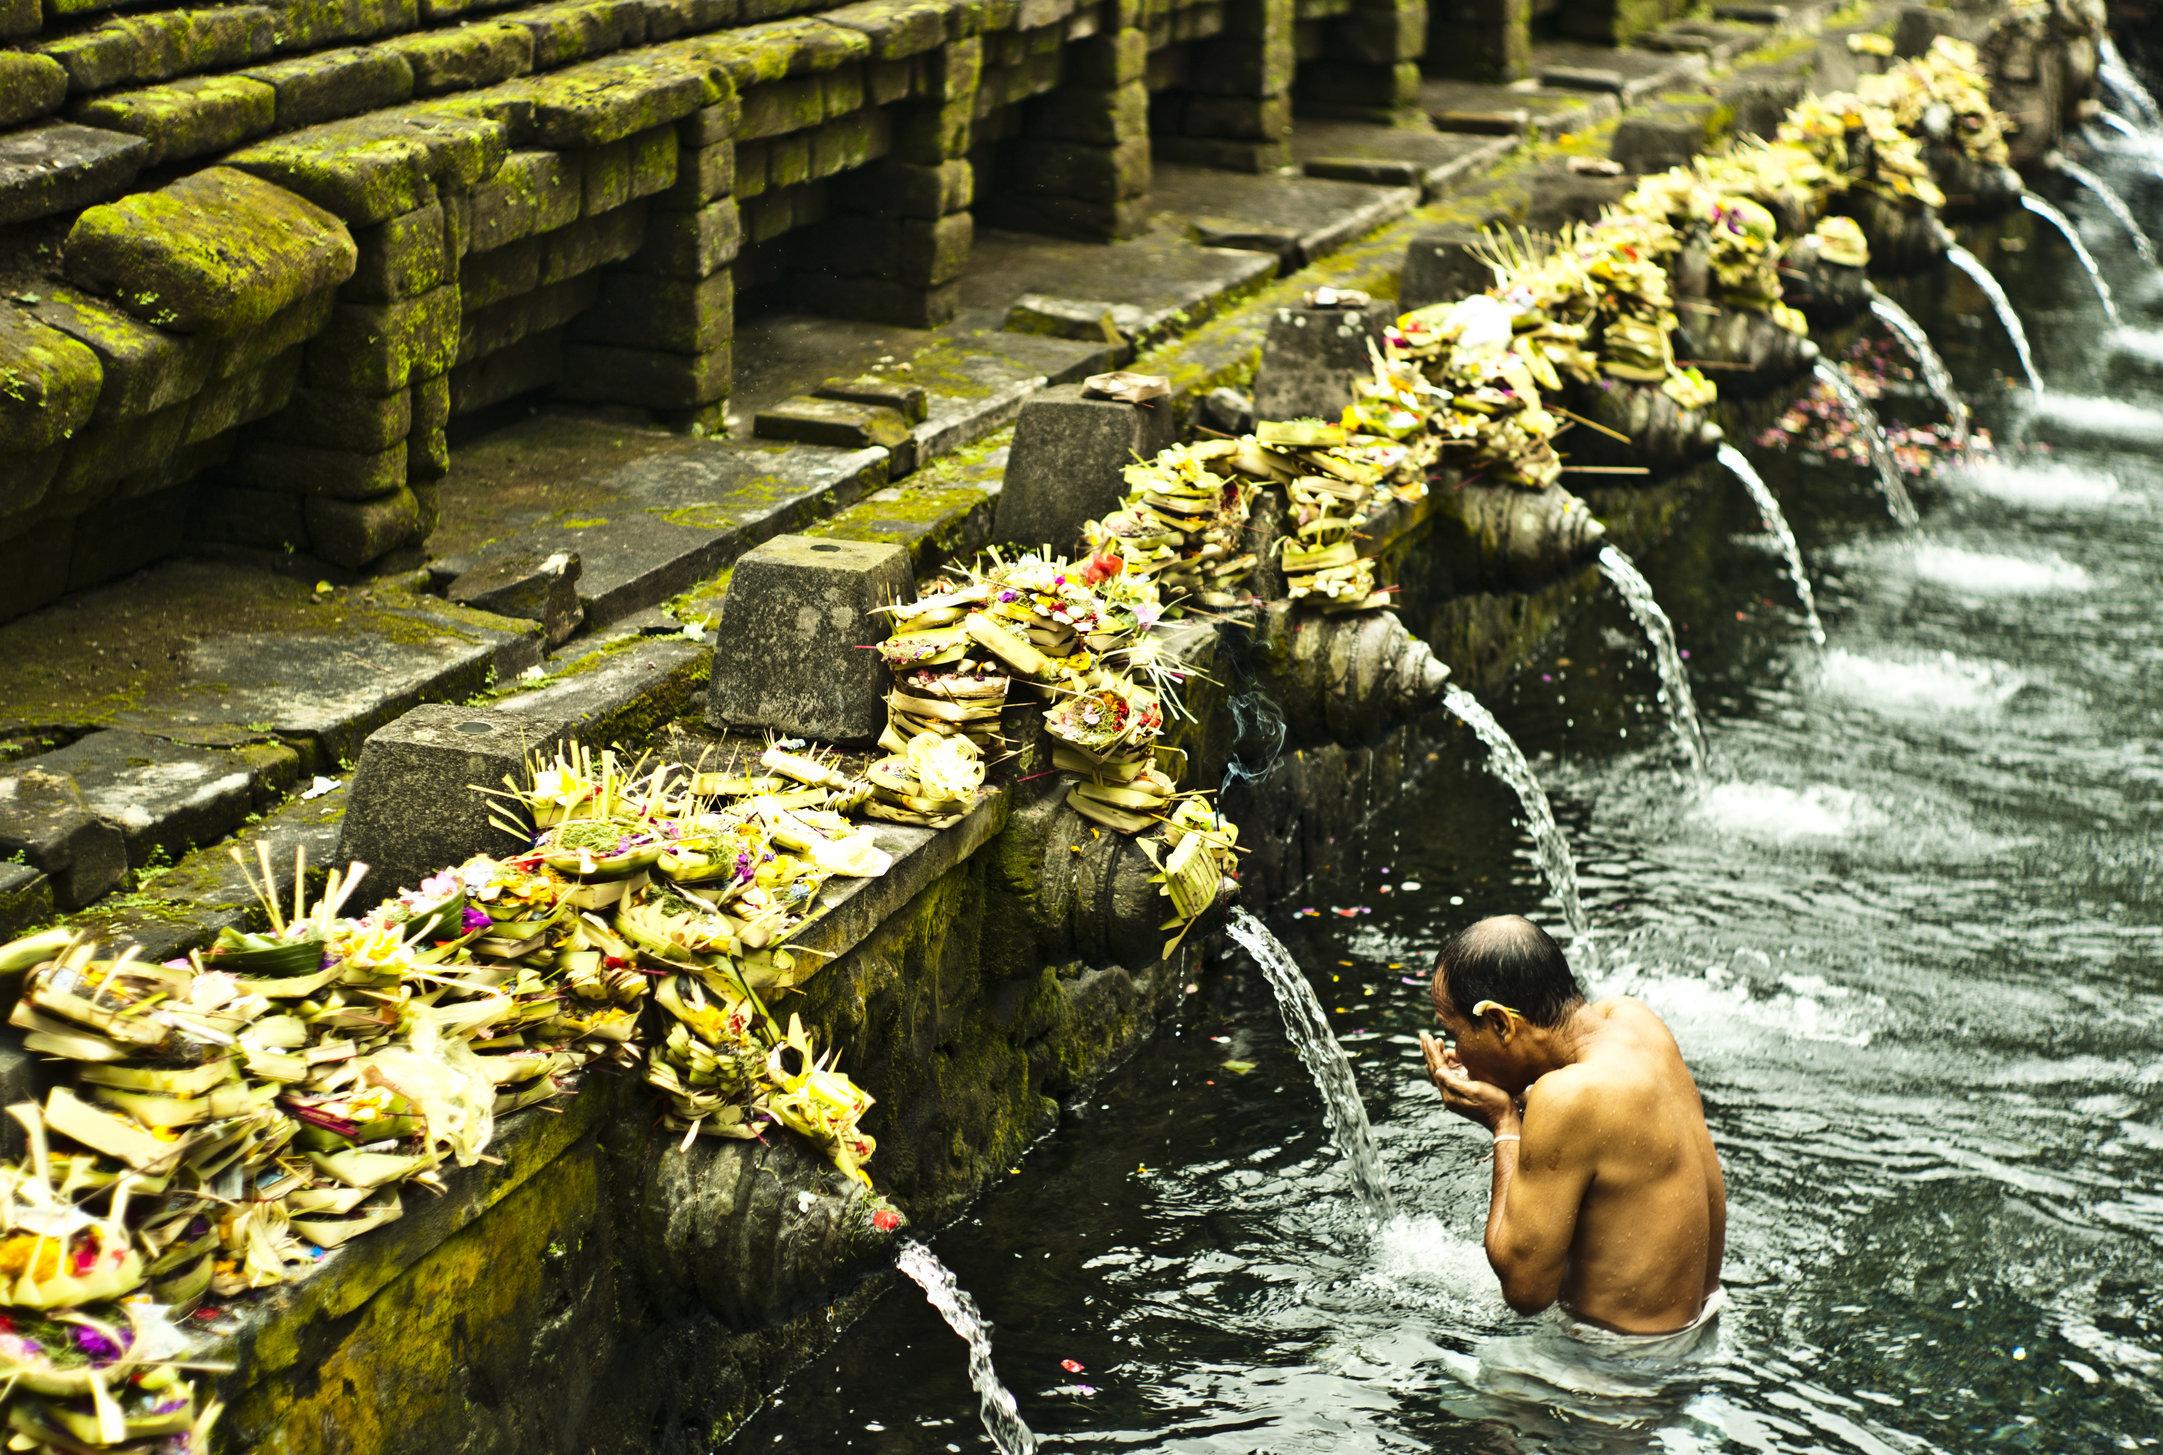 Bali, Indonesia. 2012.